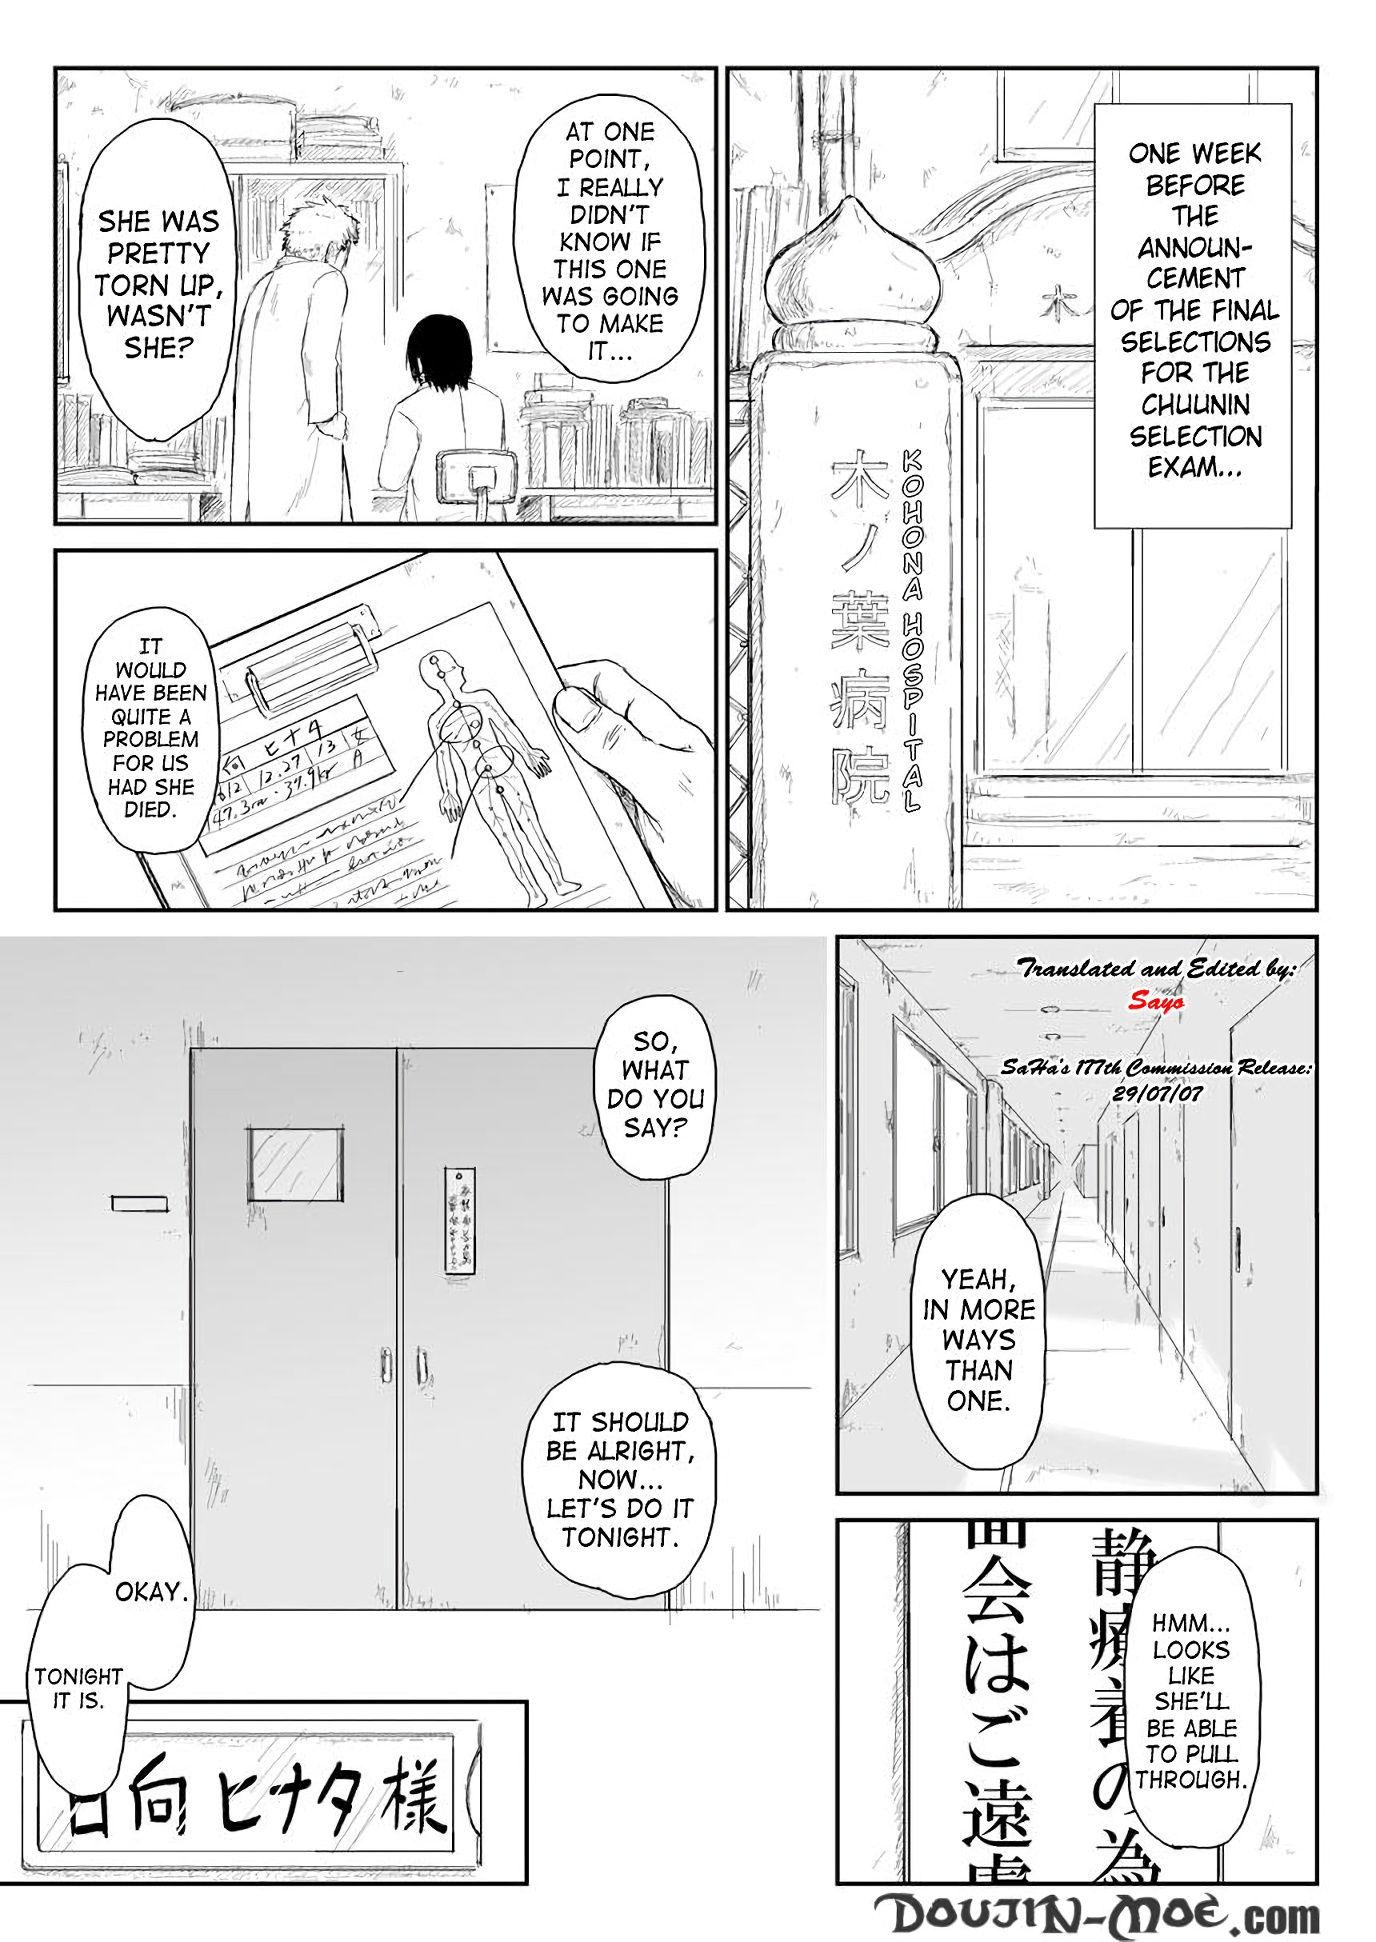 Ninja dependence vol. 3 hentai manga picture 2